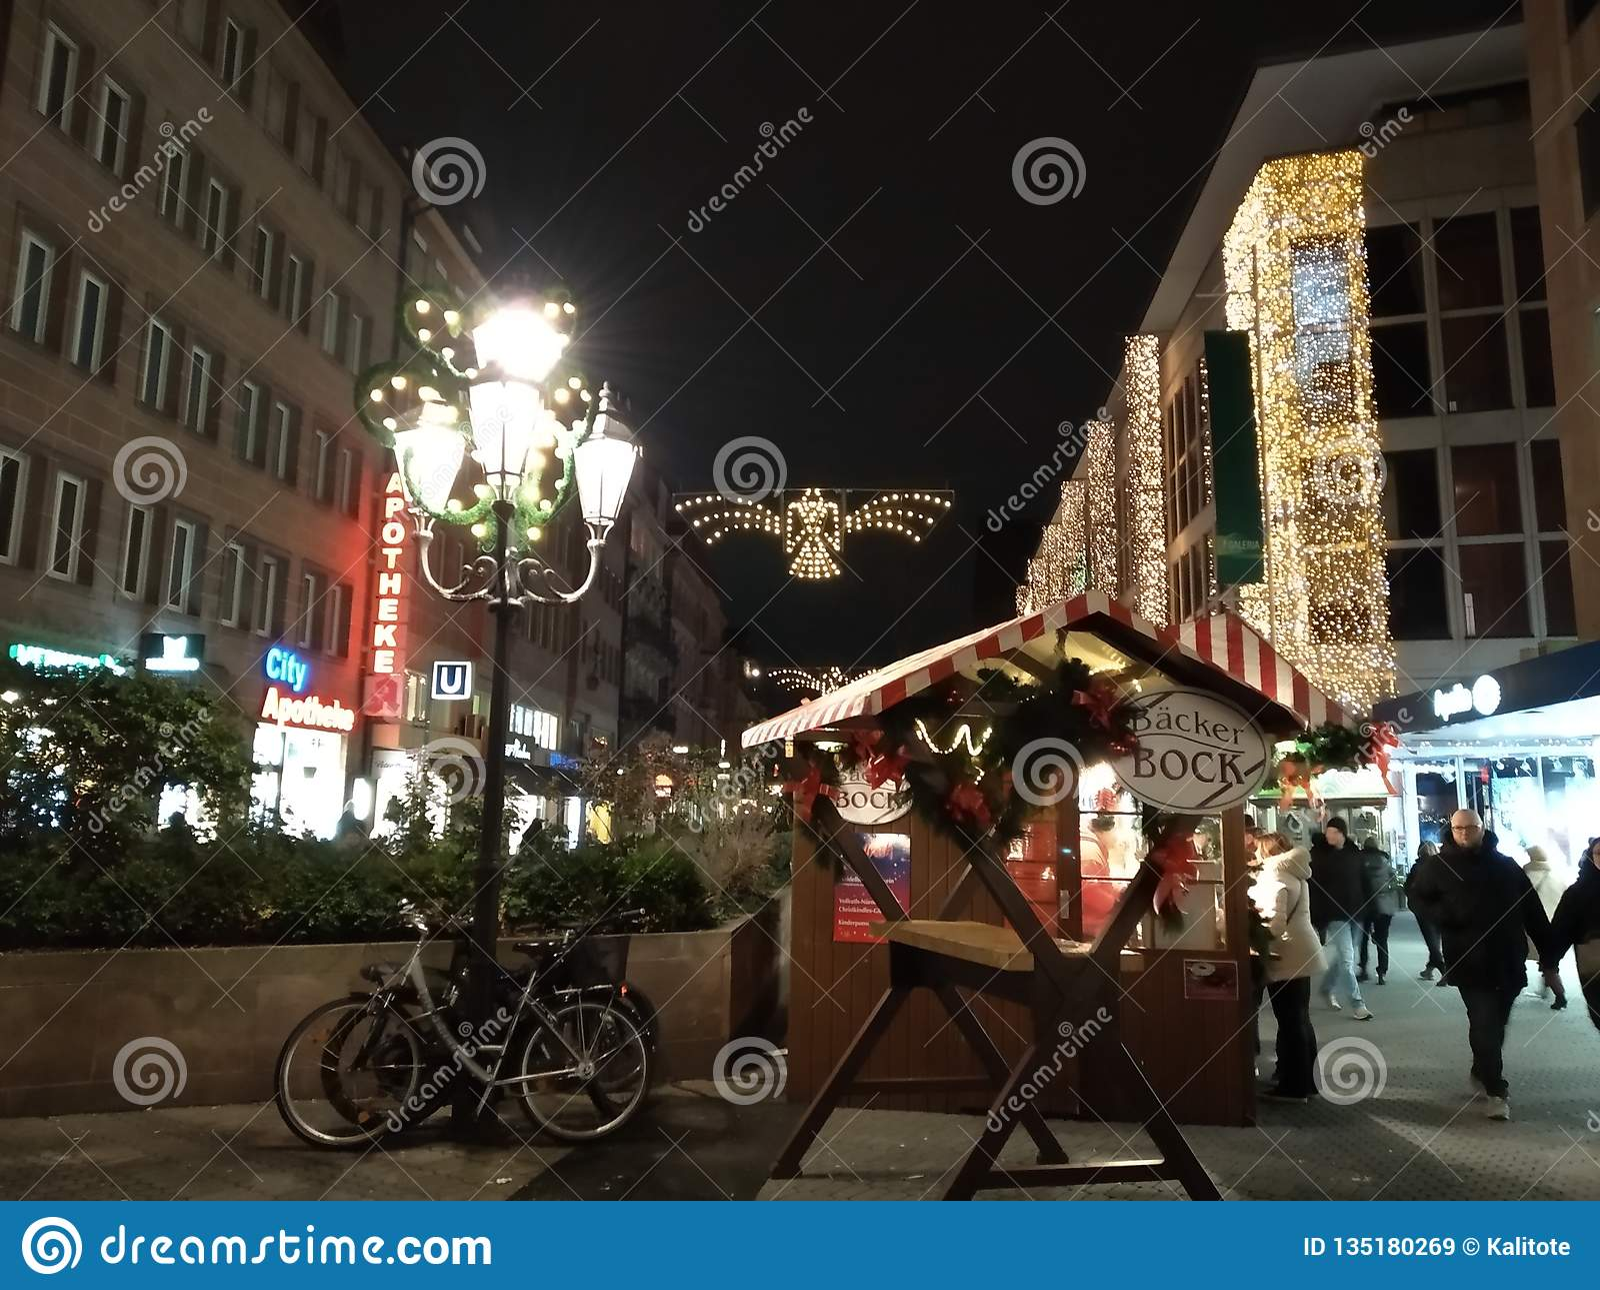 Nurnberg at Christmas, Germany.